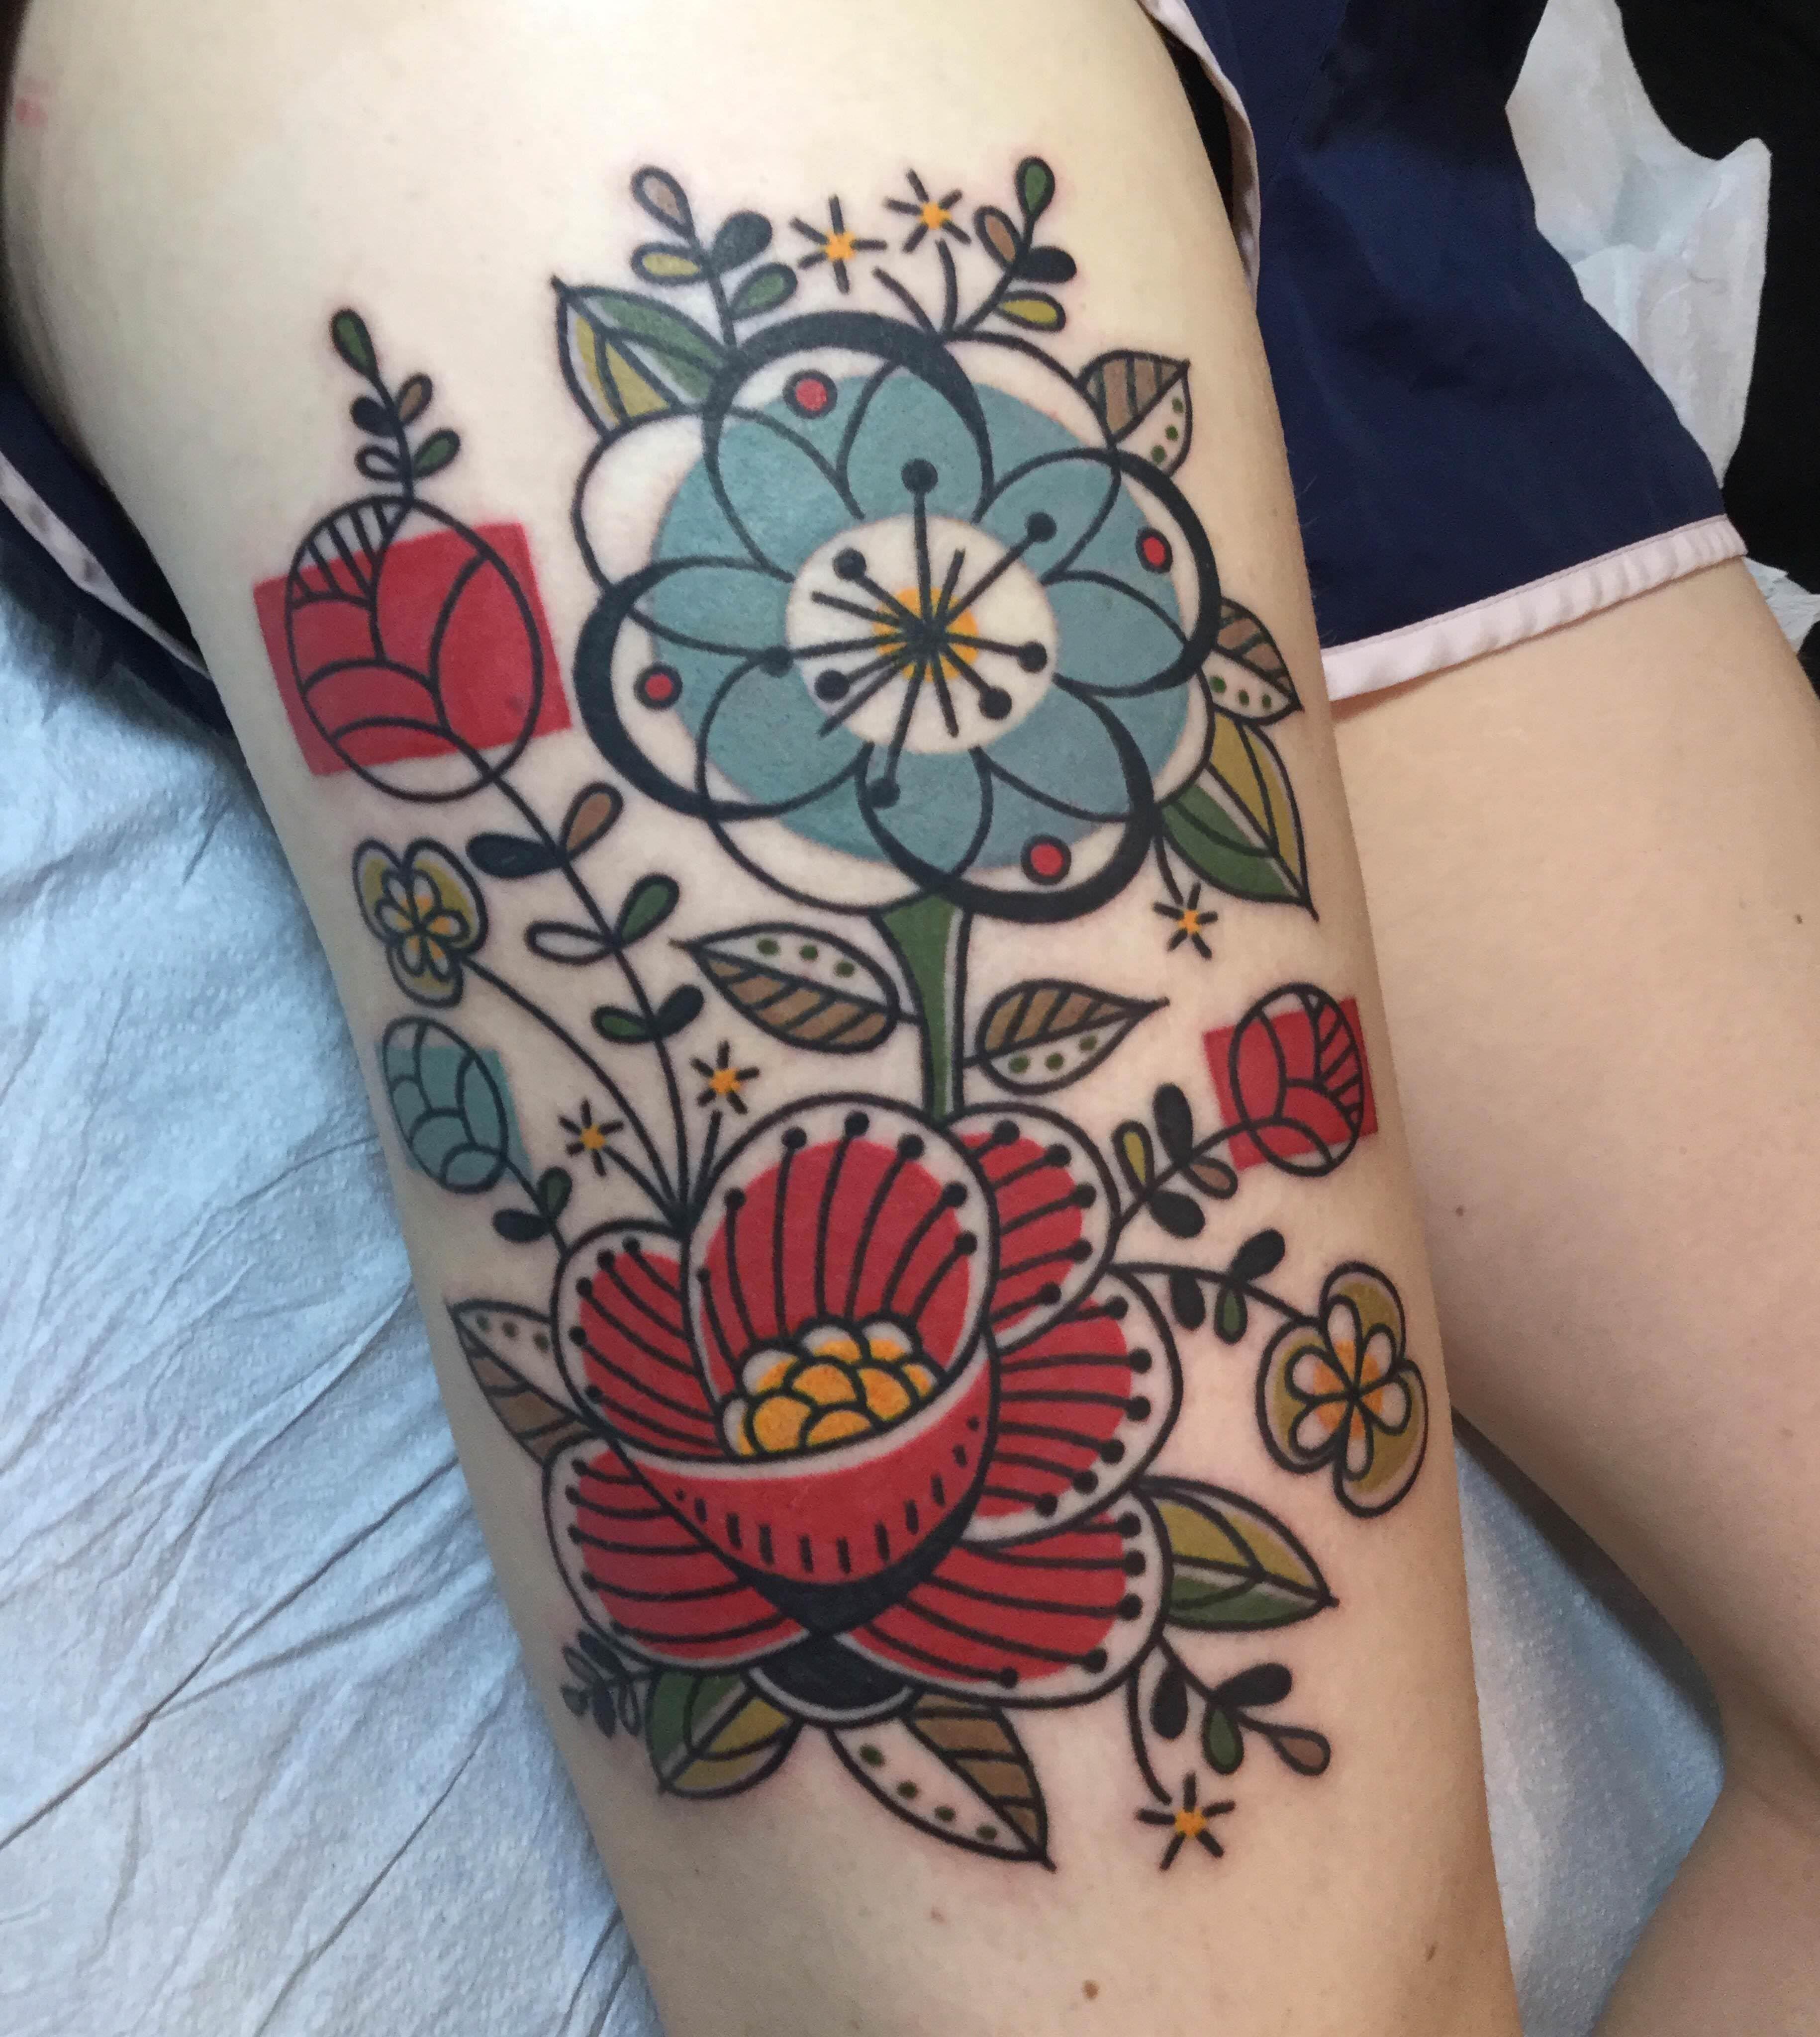 MidCentury Modern Barkcloth Floral Tattoo by Jen Trok at